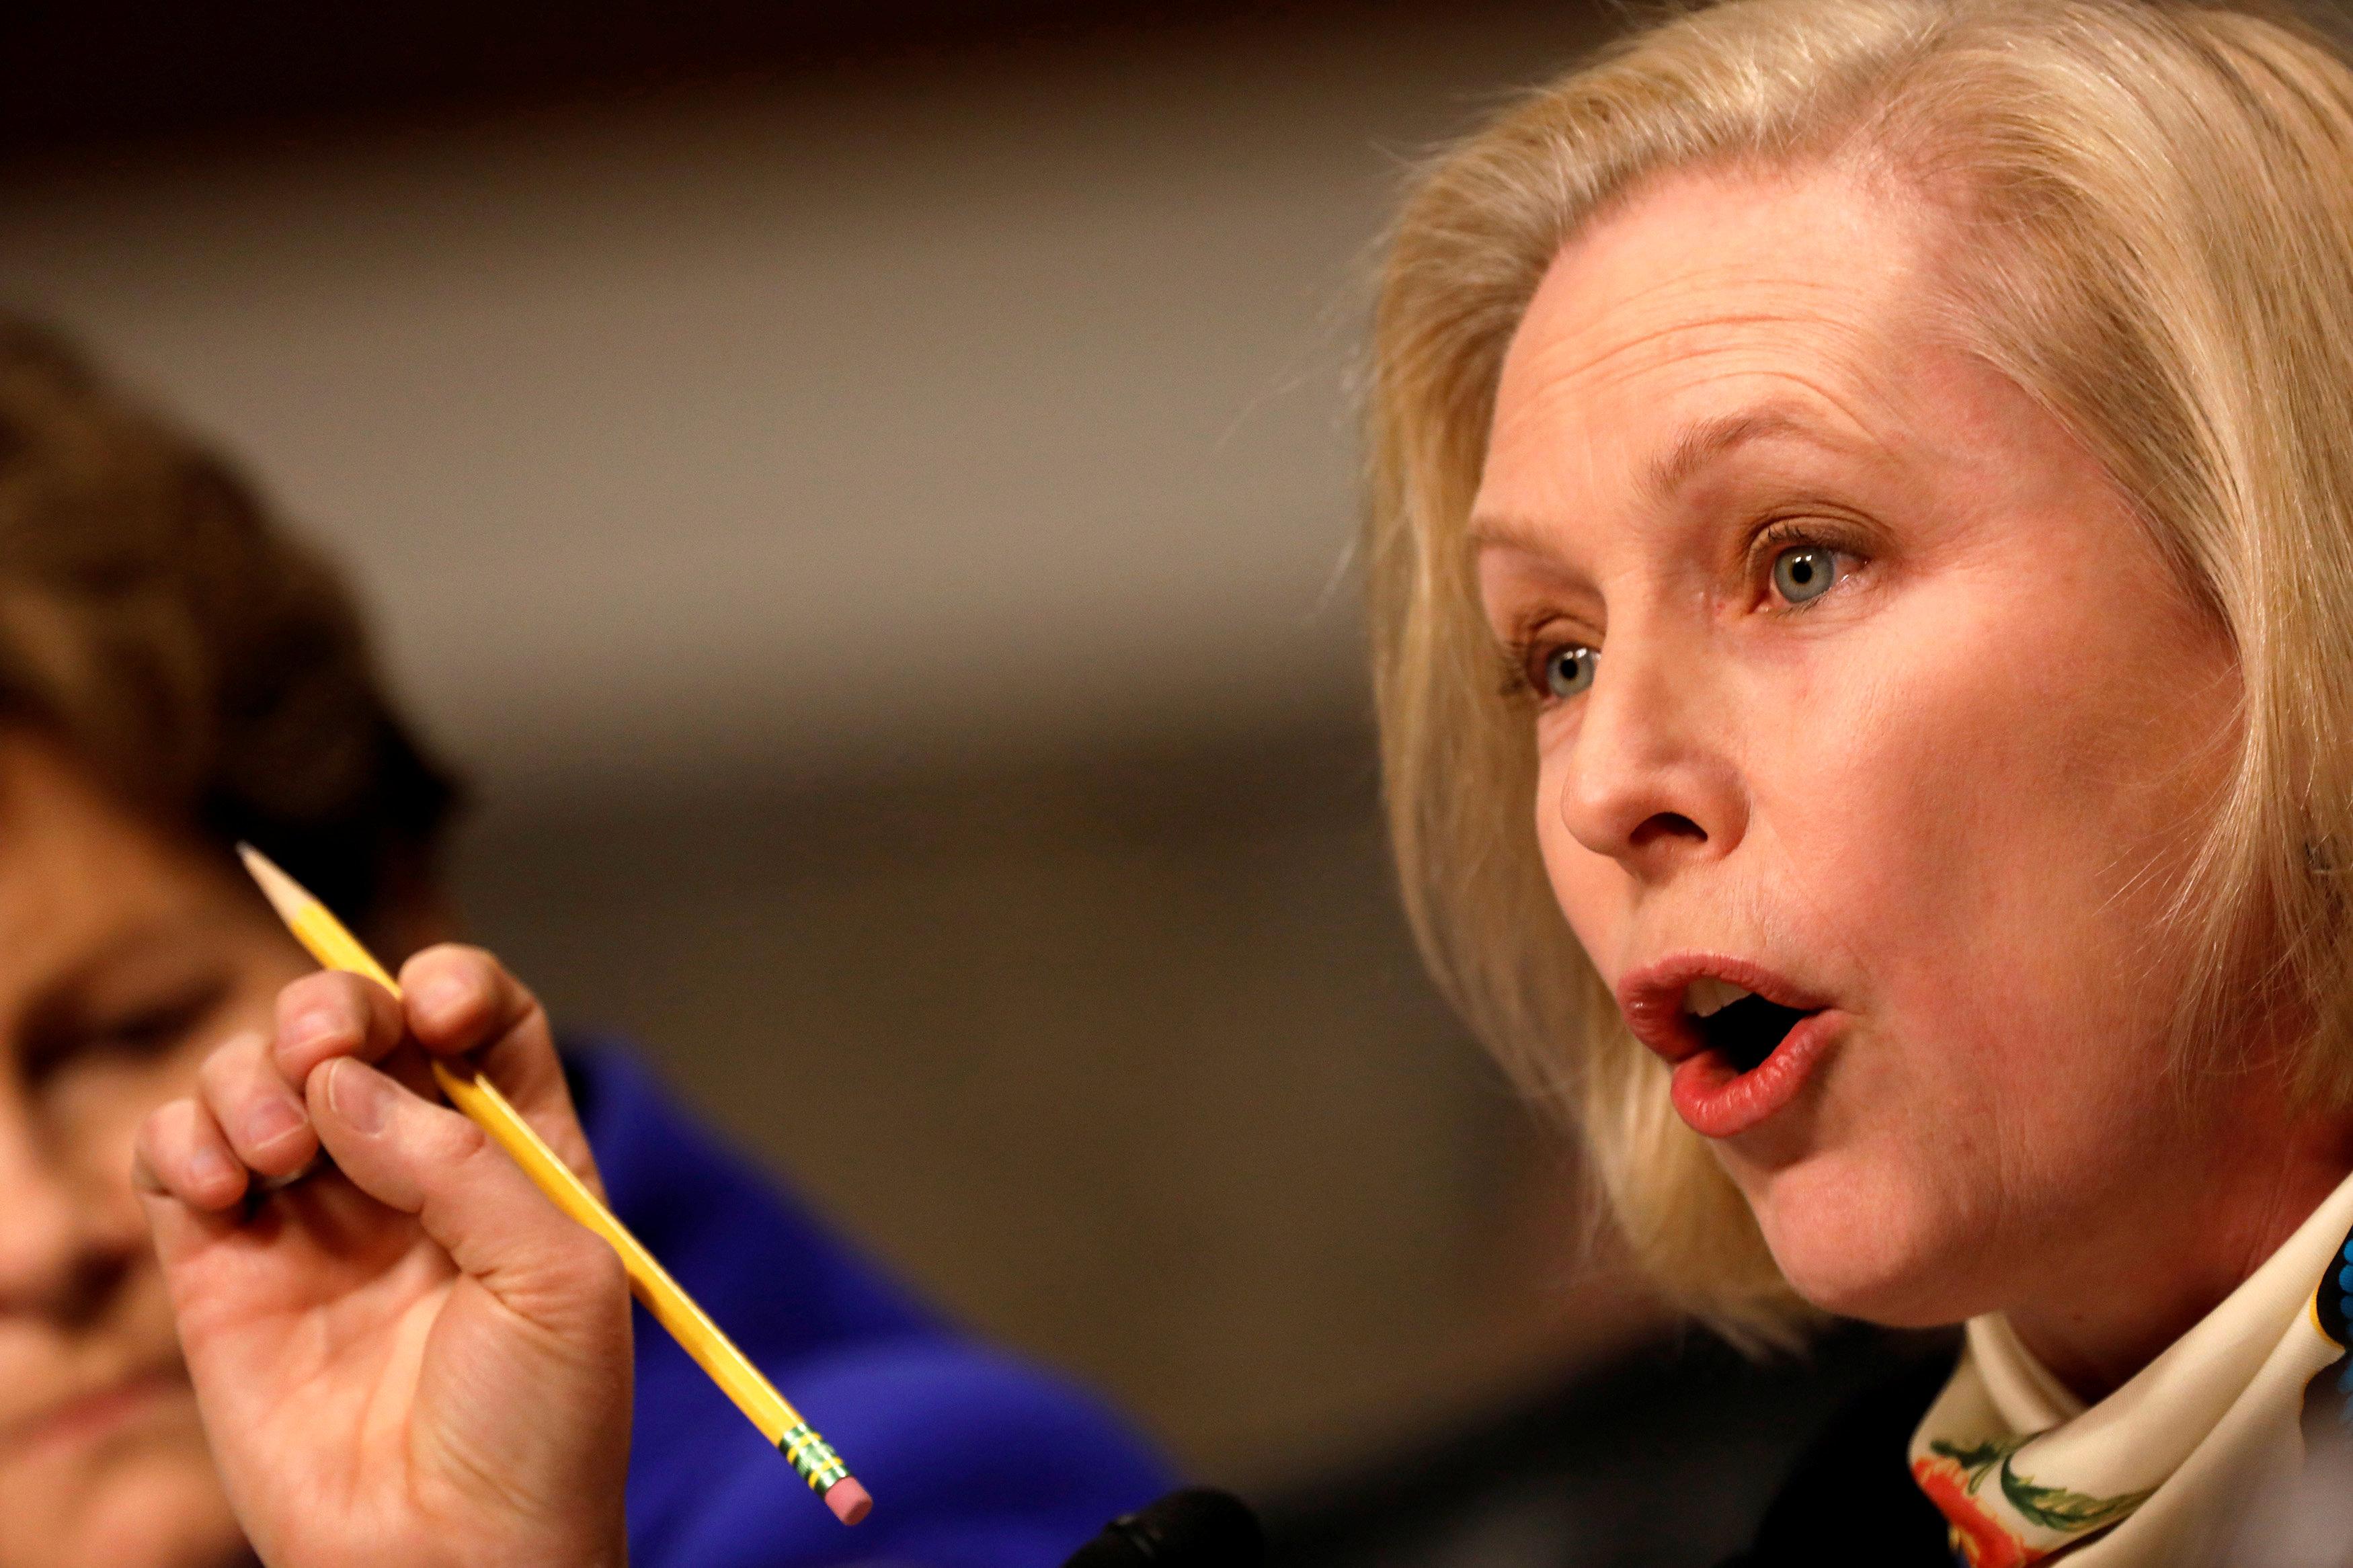 "Sen. <a href=""http://www.huffingtonpost.com/topic/kirsten-gillibrand"" target=""_blank"">Kirsten Gillibrand</a> (D-N.Y.) has del"